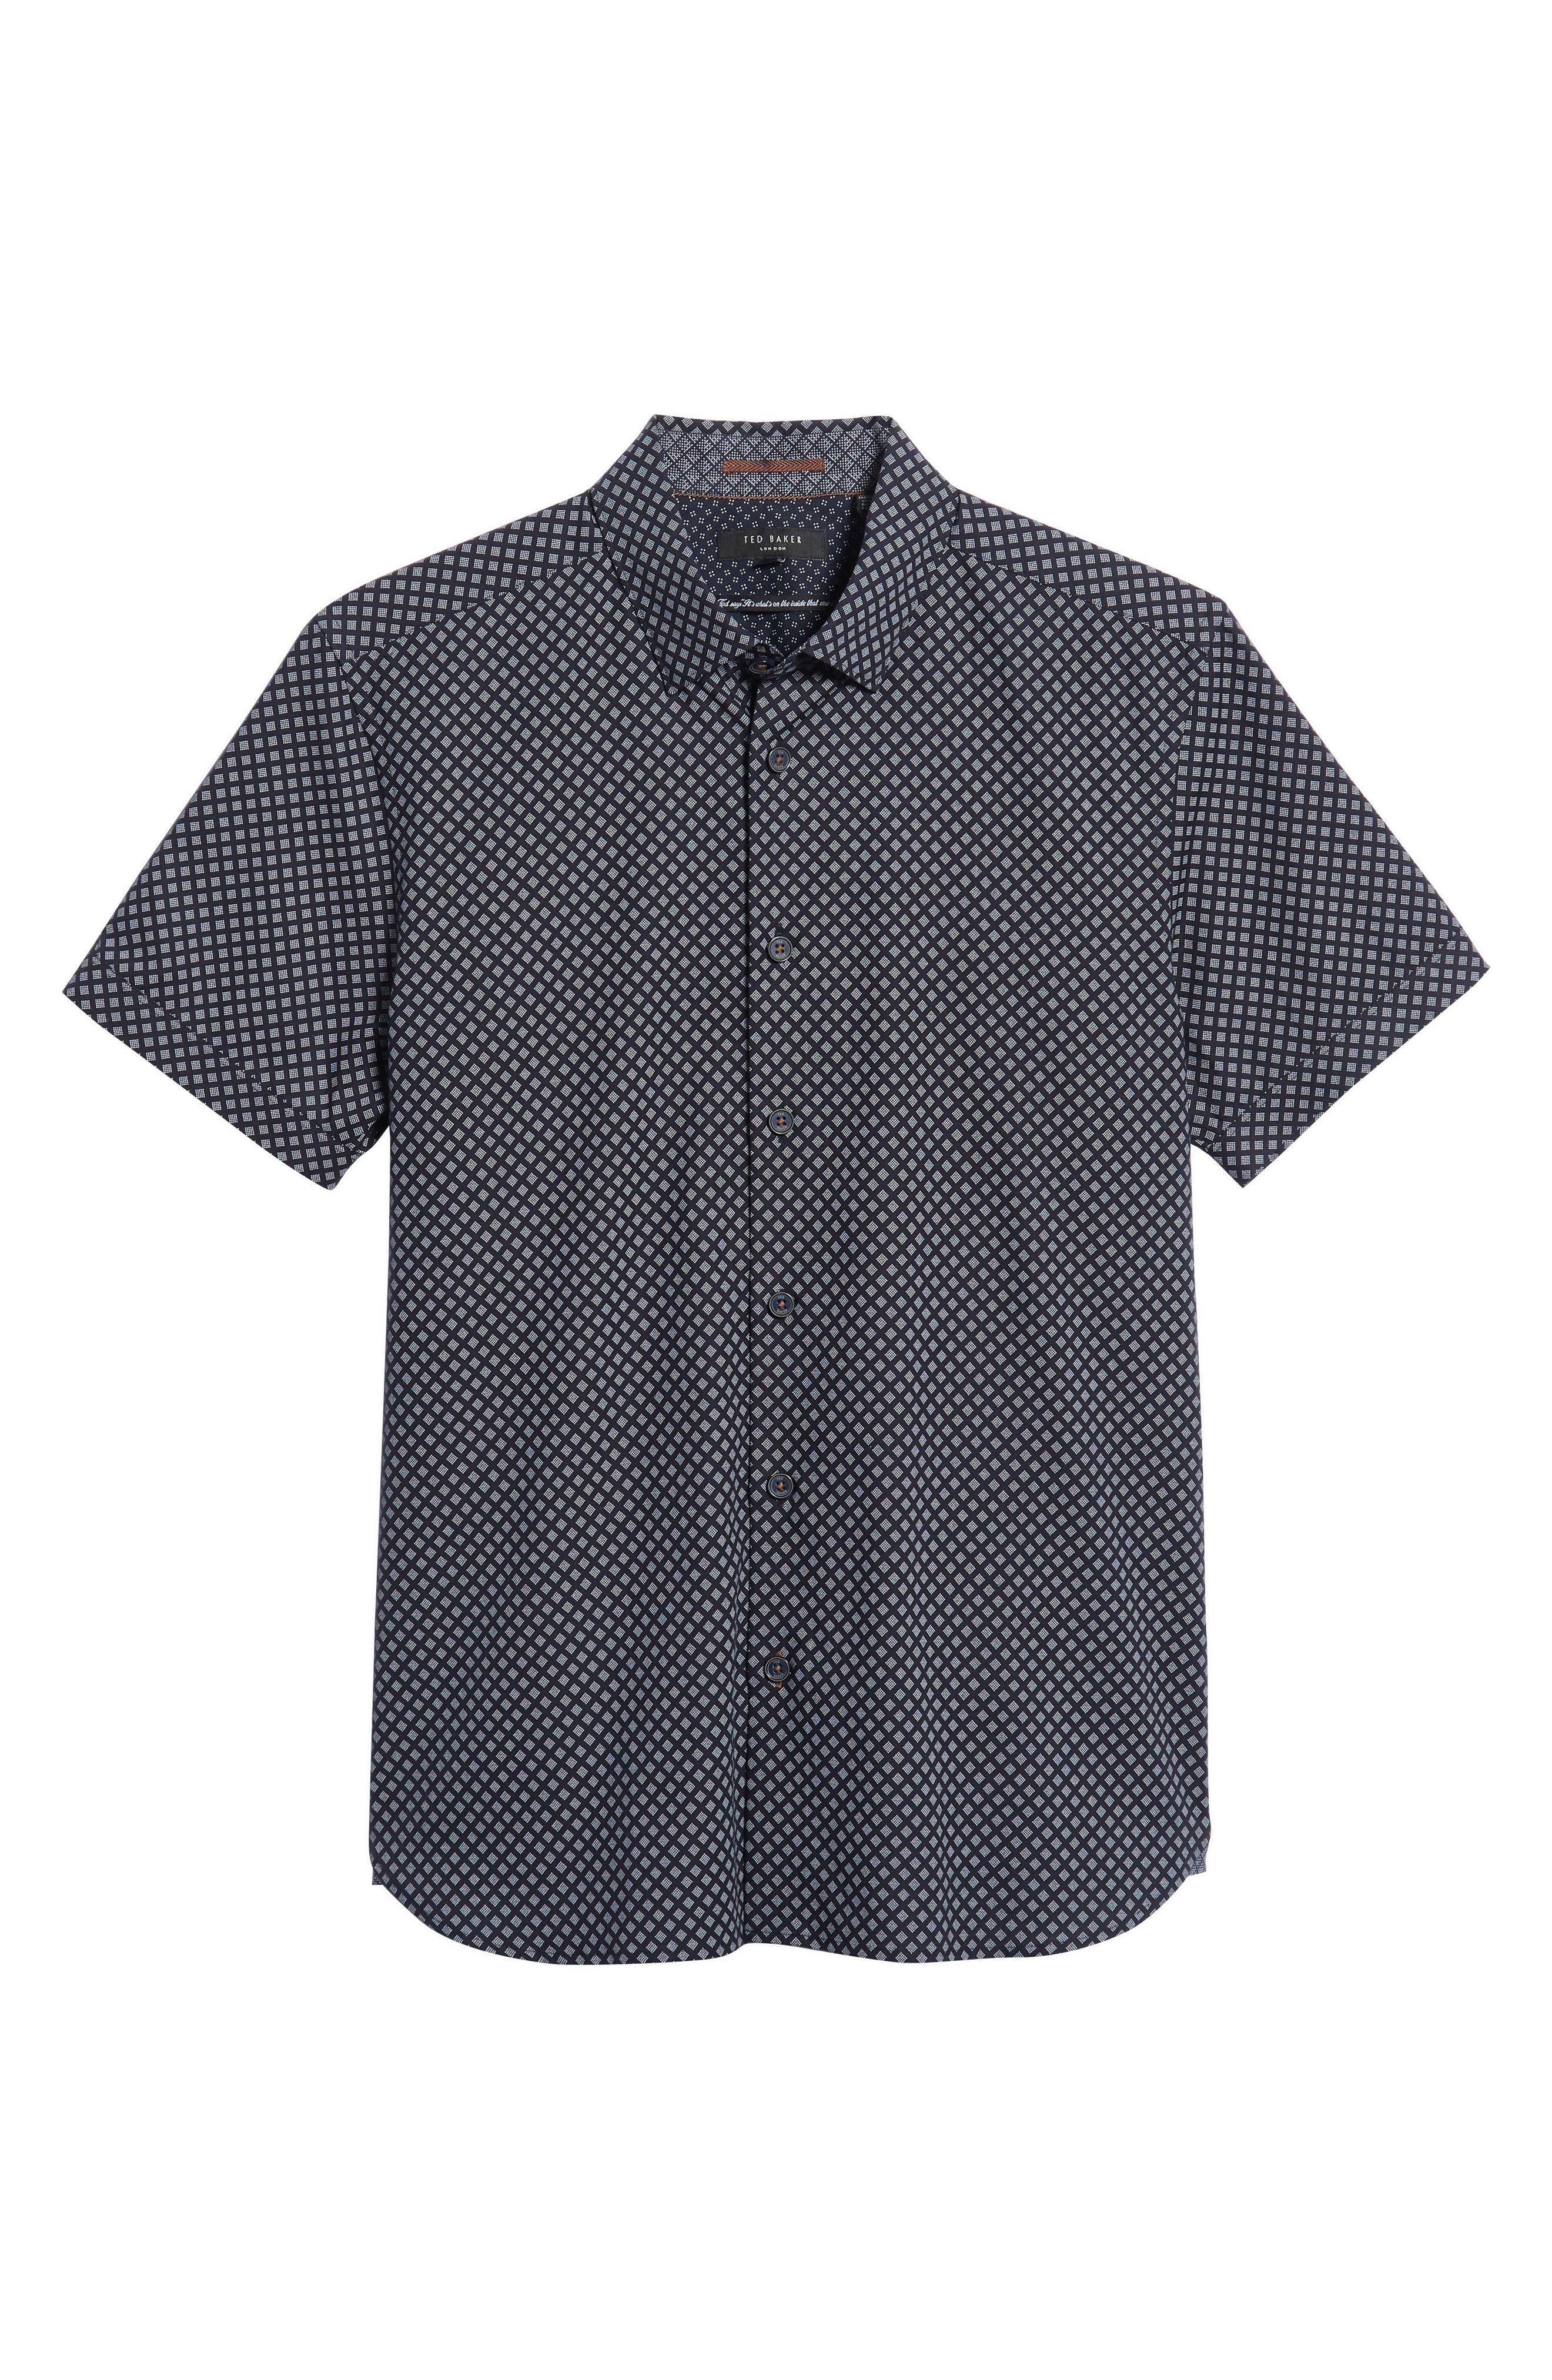 Slim Fit Foresth Diamond Pattern Woven Shirt,                             Alternate thumbnail 5, color,                             NAVY